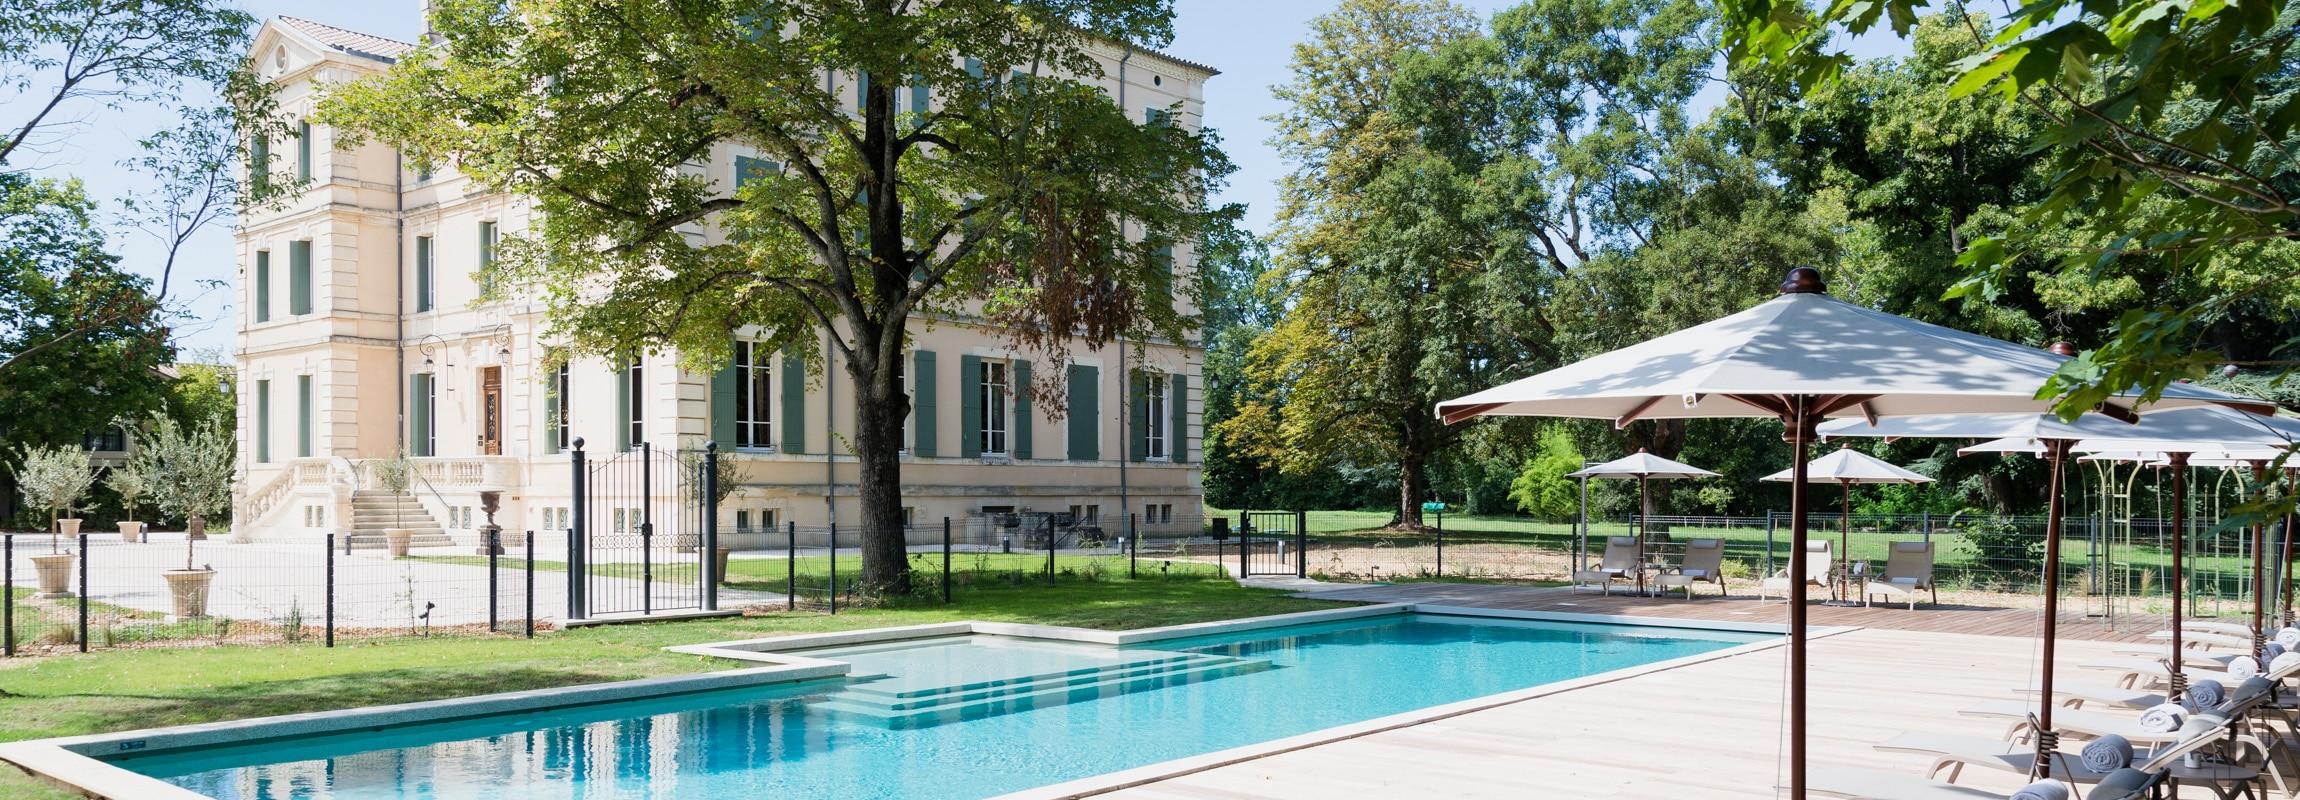 Das Schwimmbad des Château de Montcaud liegt in der Verlängerung der Schlossallée.